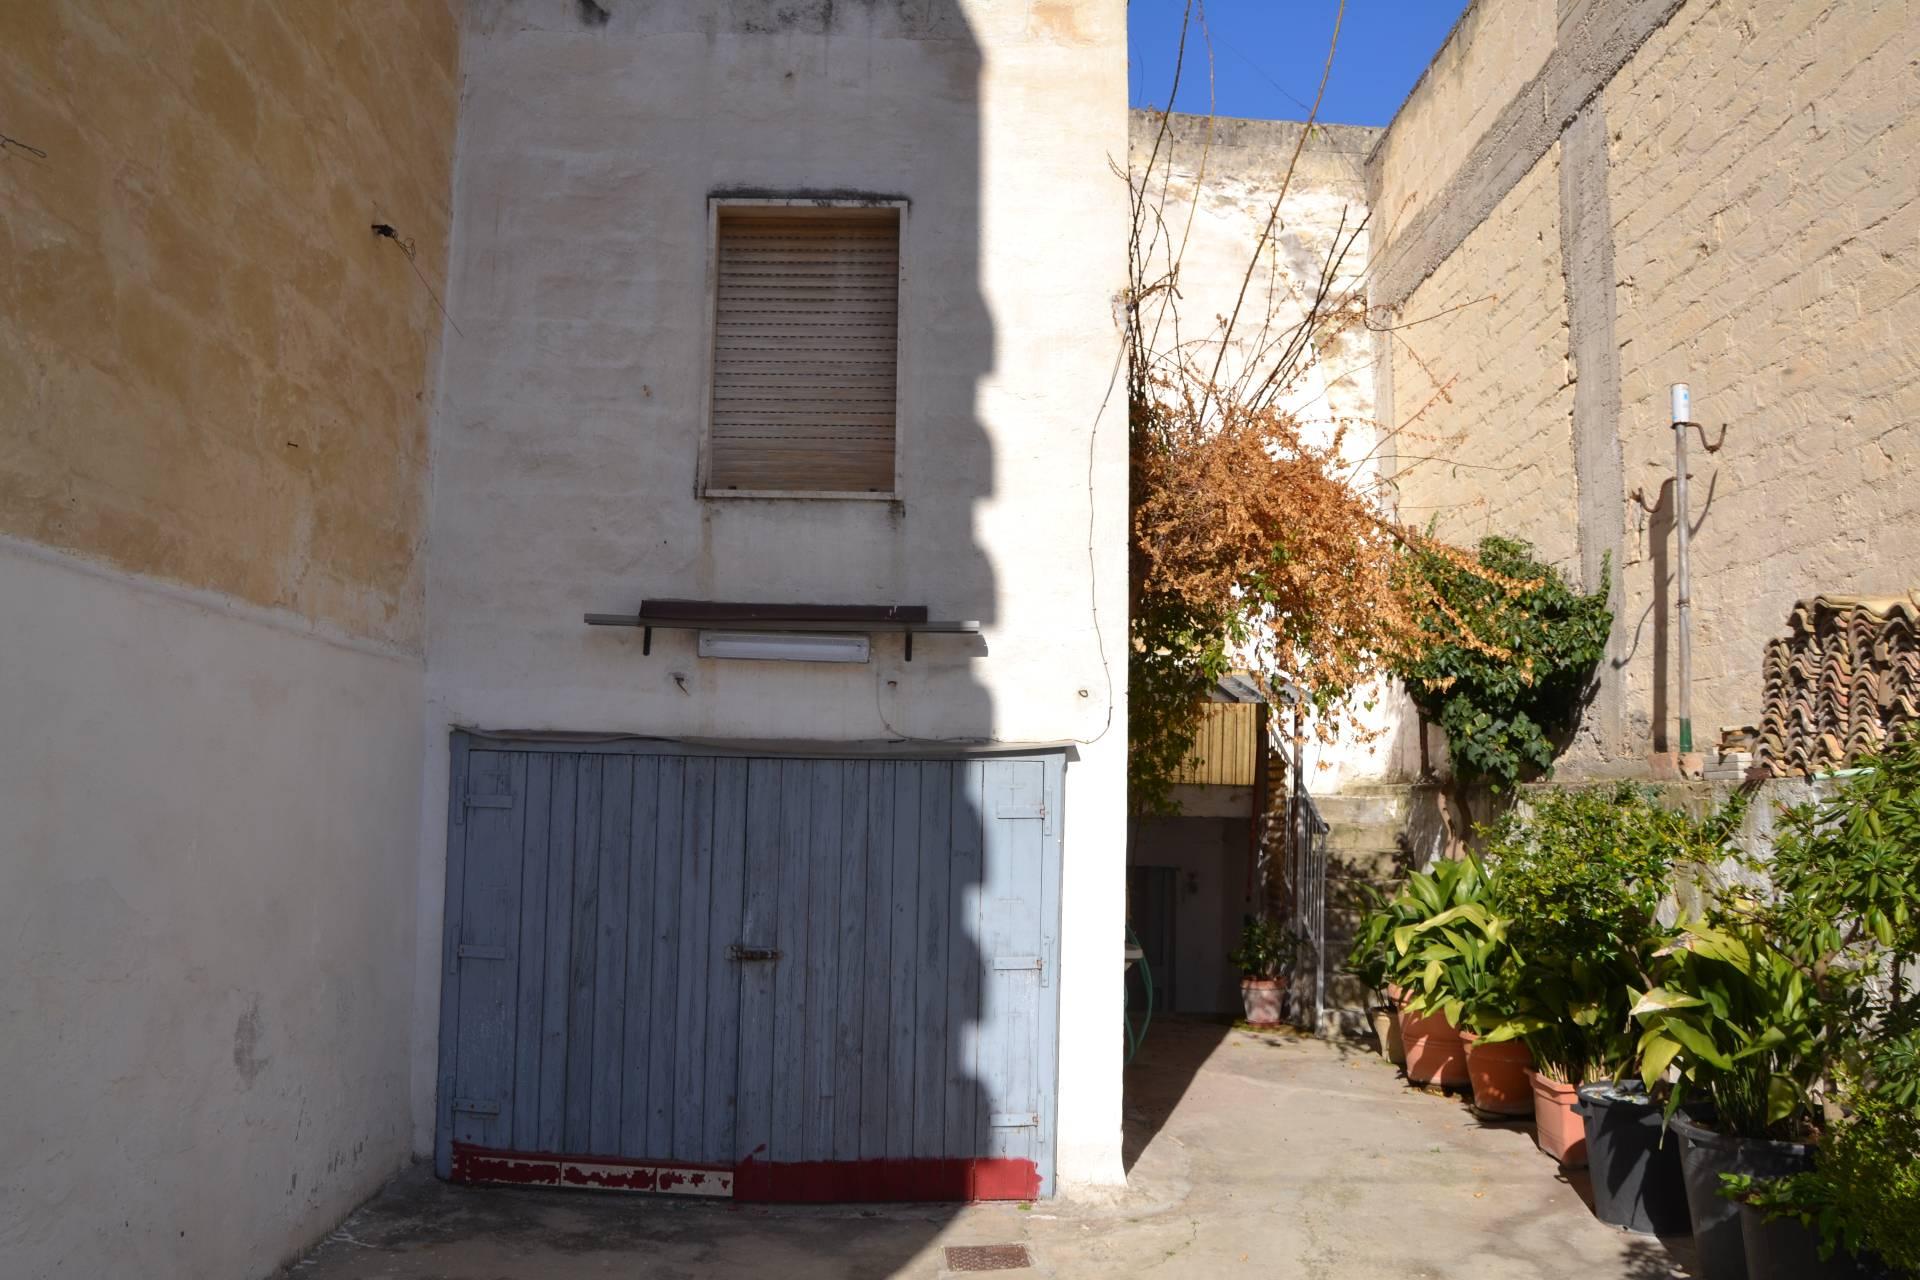 Casa singola in vendita a canosa di puglia cod r448 - Piano casa regione puglia ...